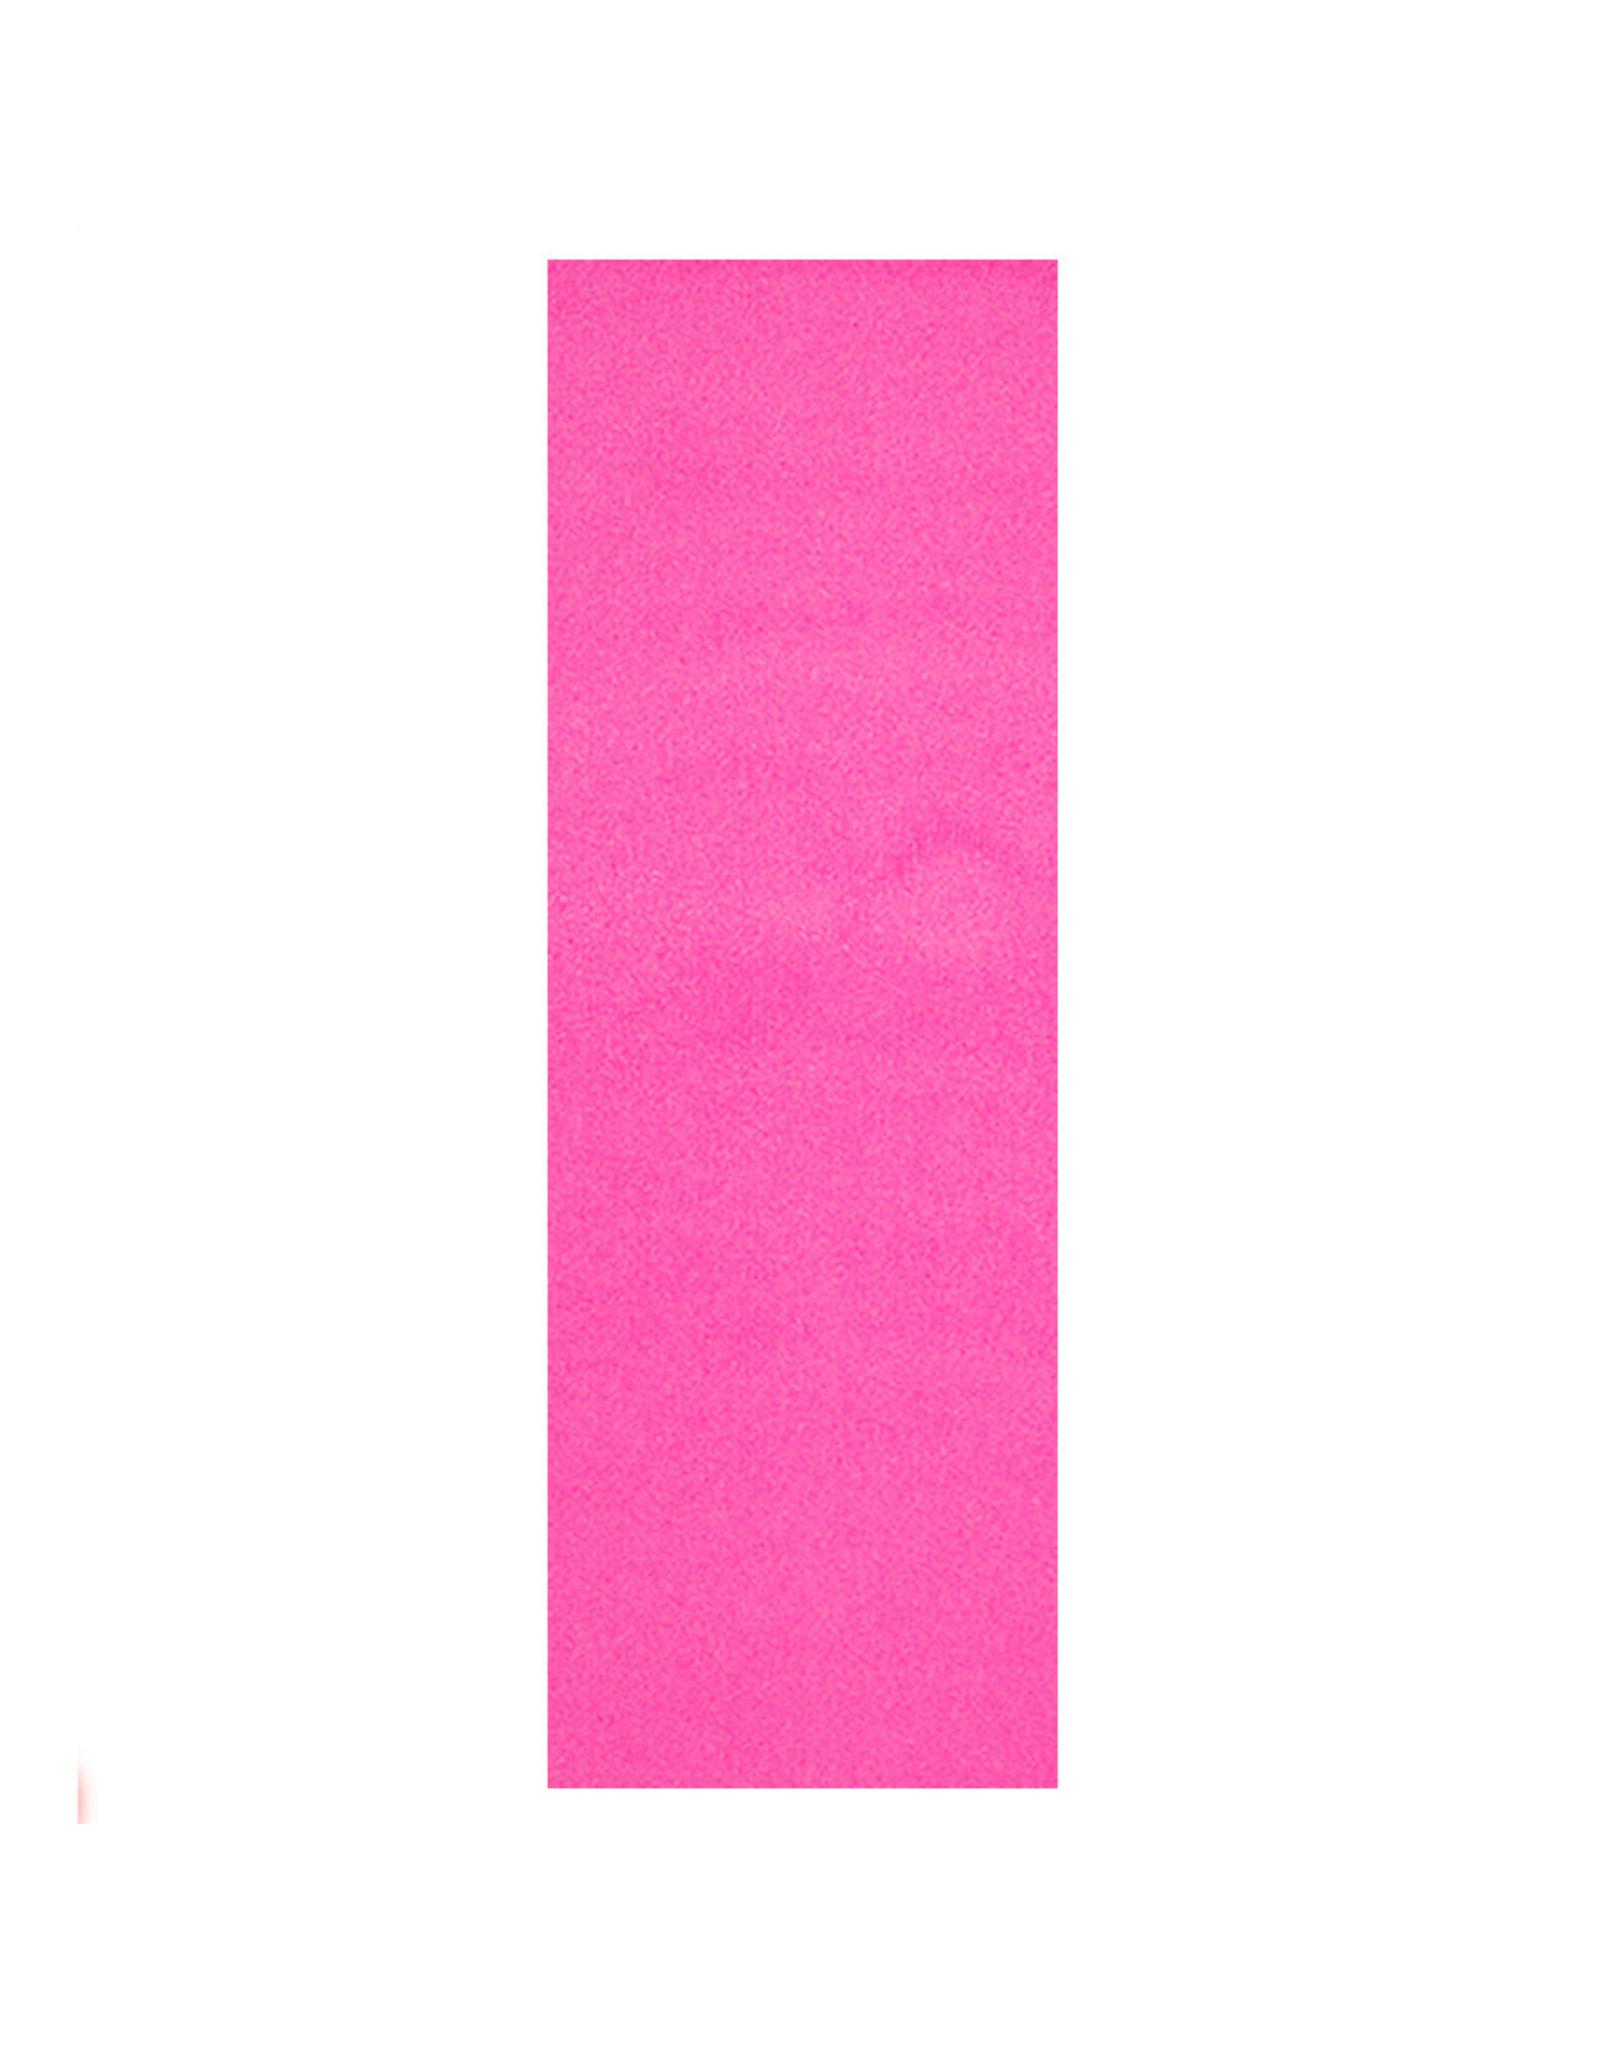 Flik Grip Tape (Neon Pink)